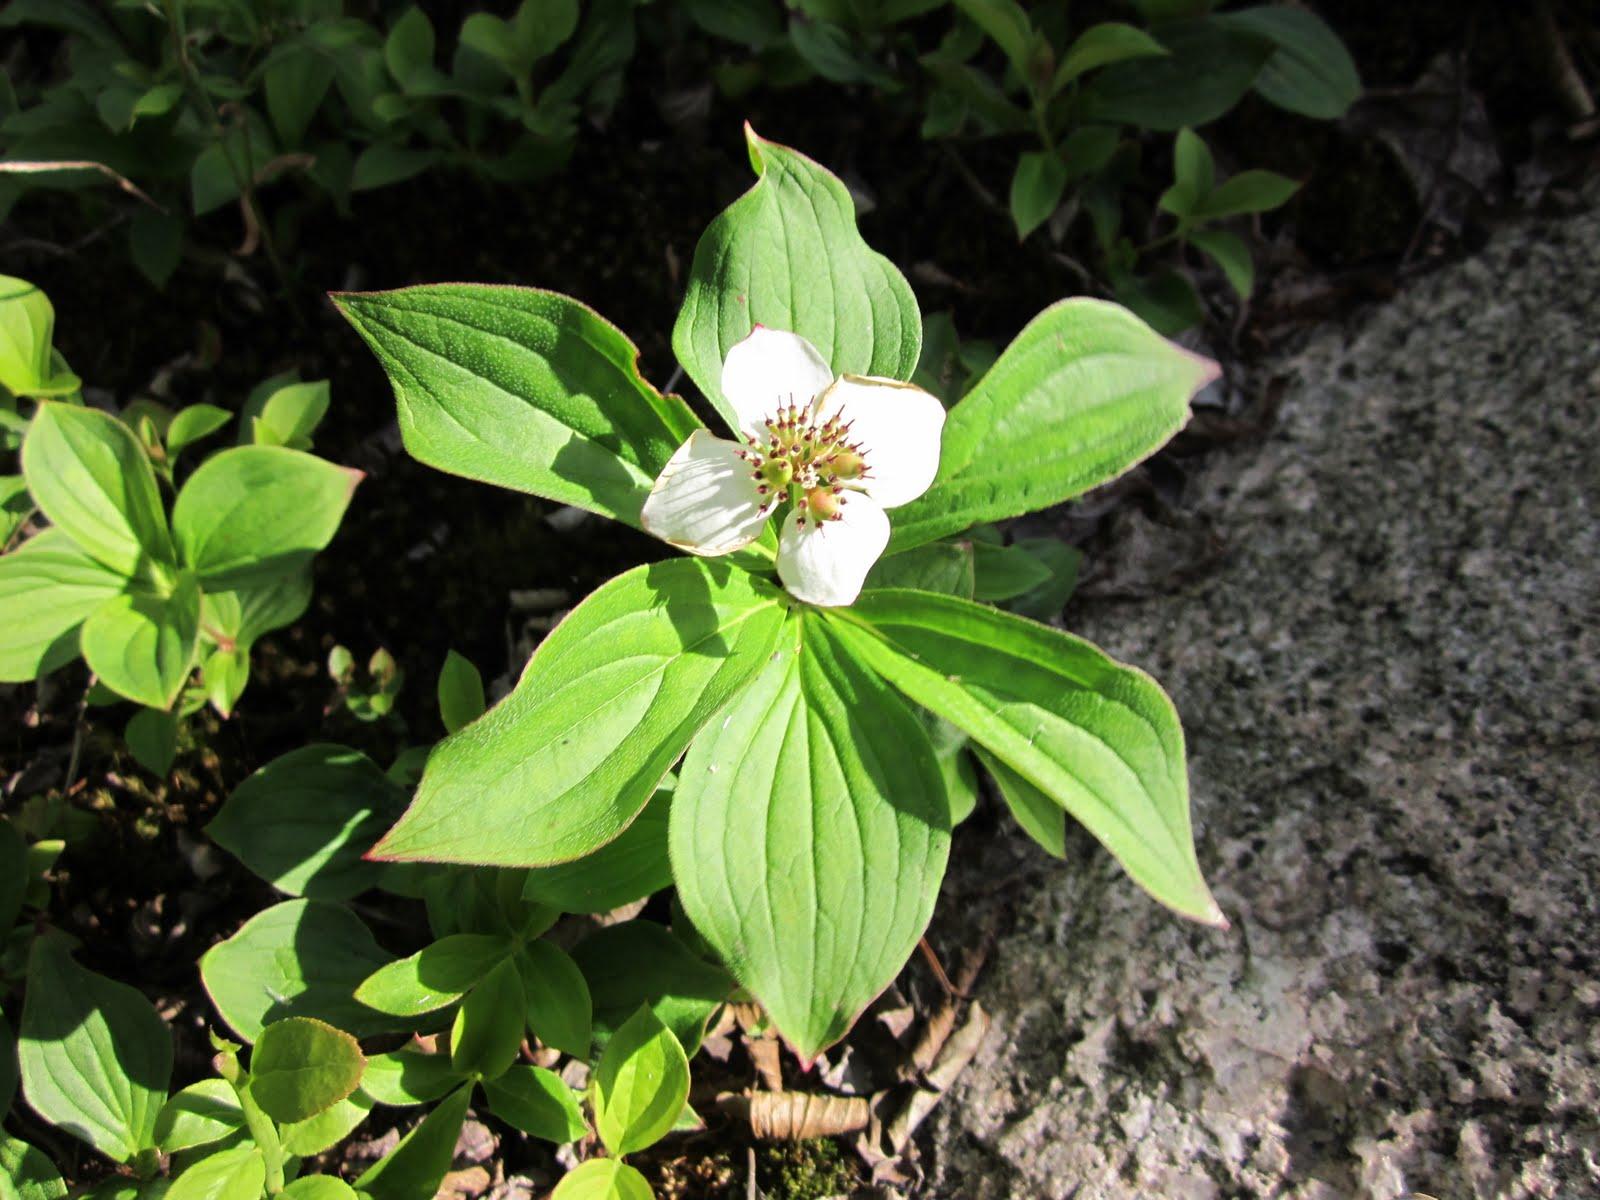 Shrubs And Wildflowers Erringtons Wilderness Island